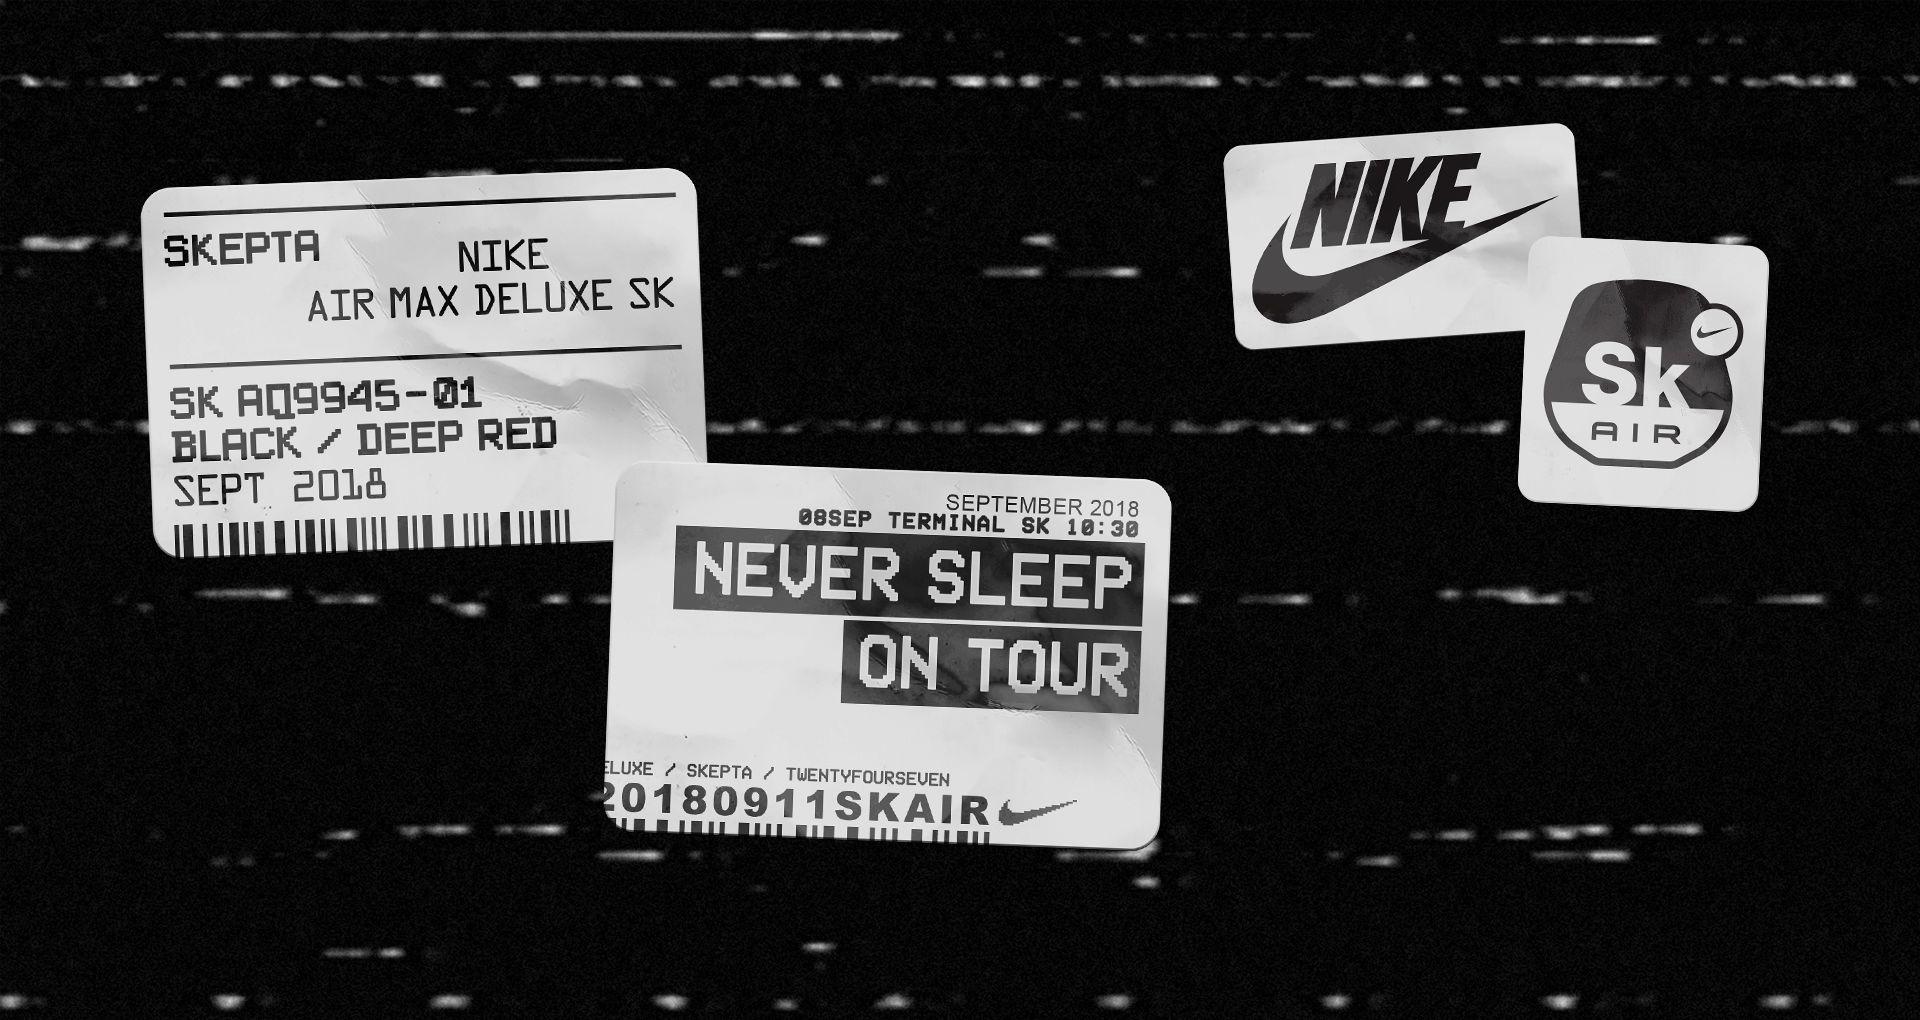 Nike Air Max Deluxe SK AIR Skepta 'Never Sleep on Tour